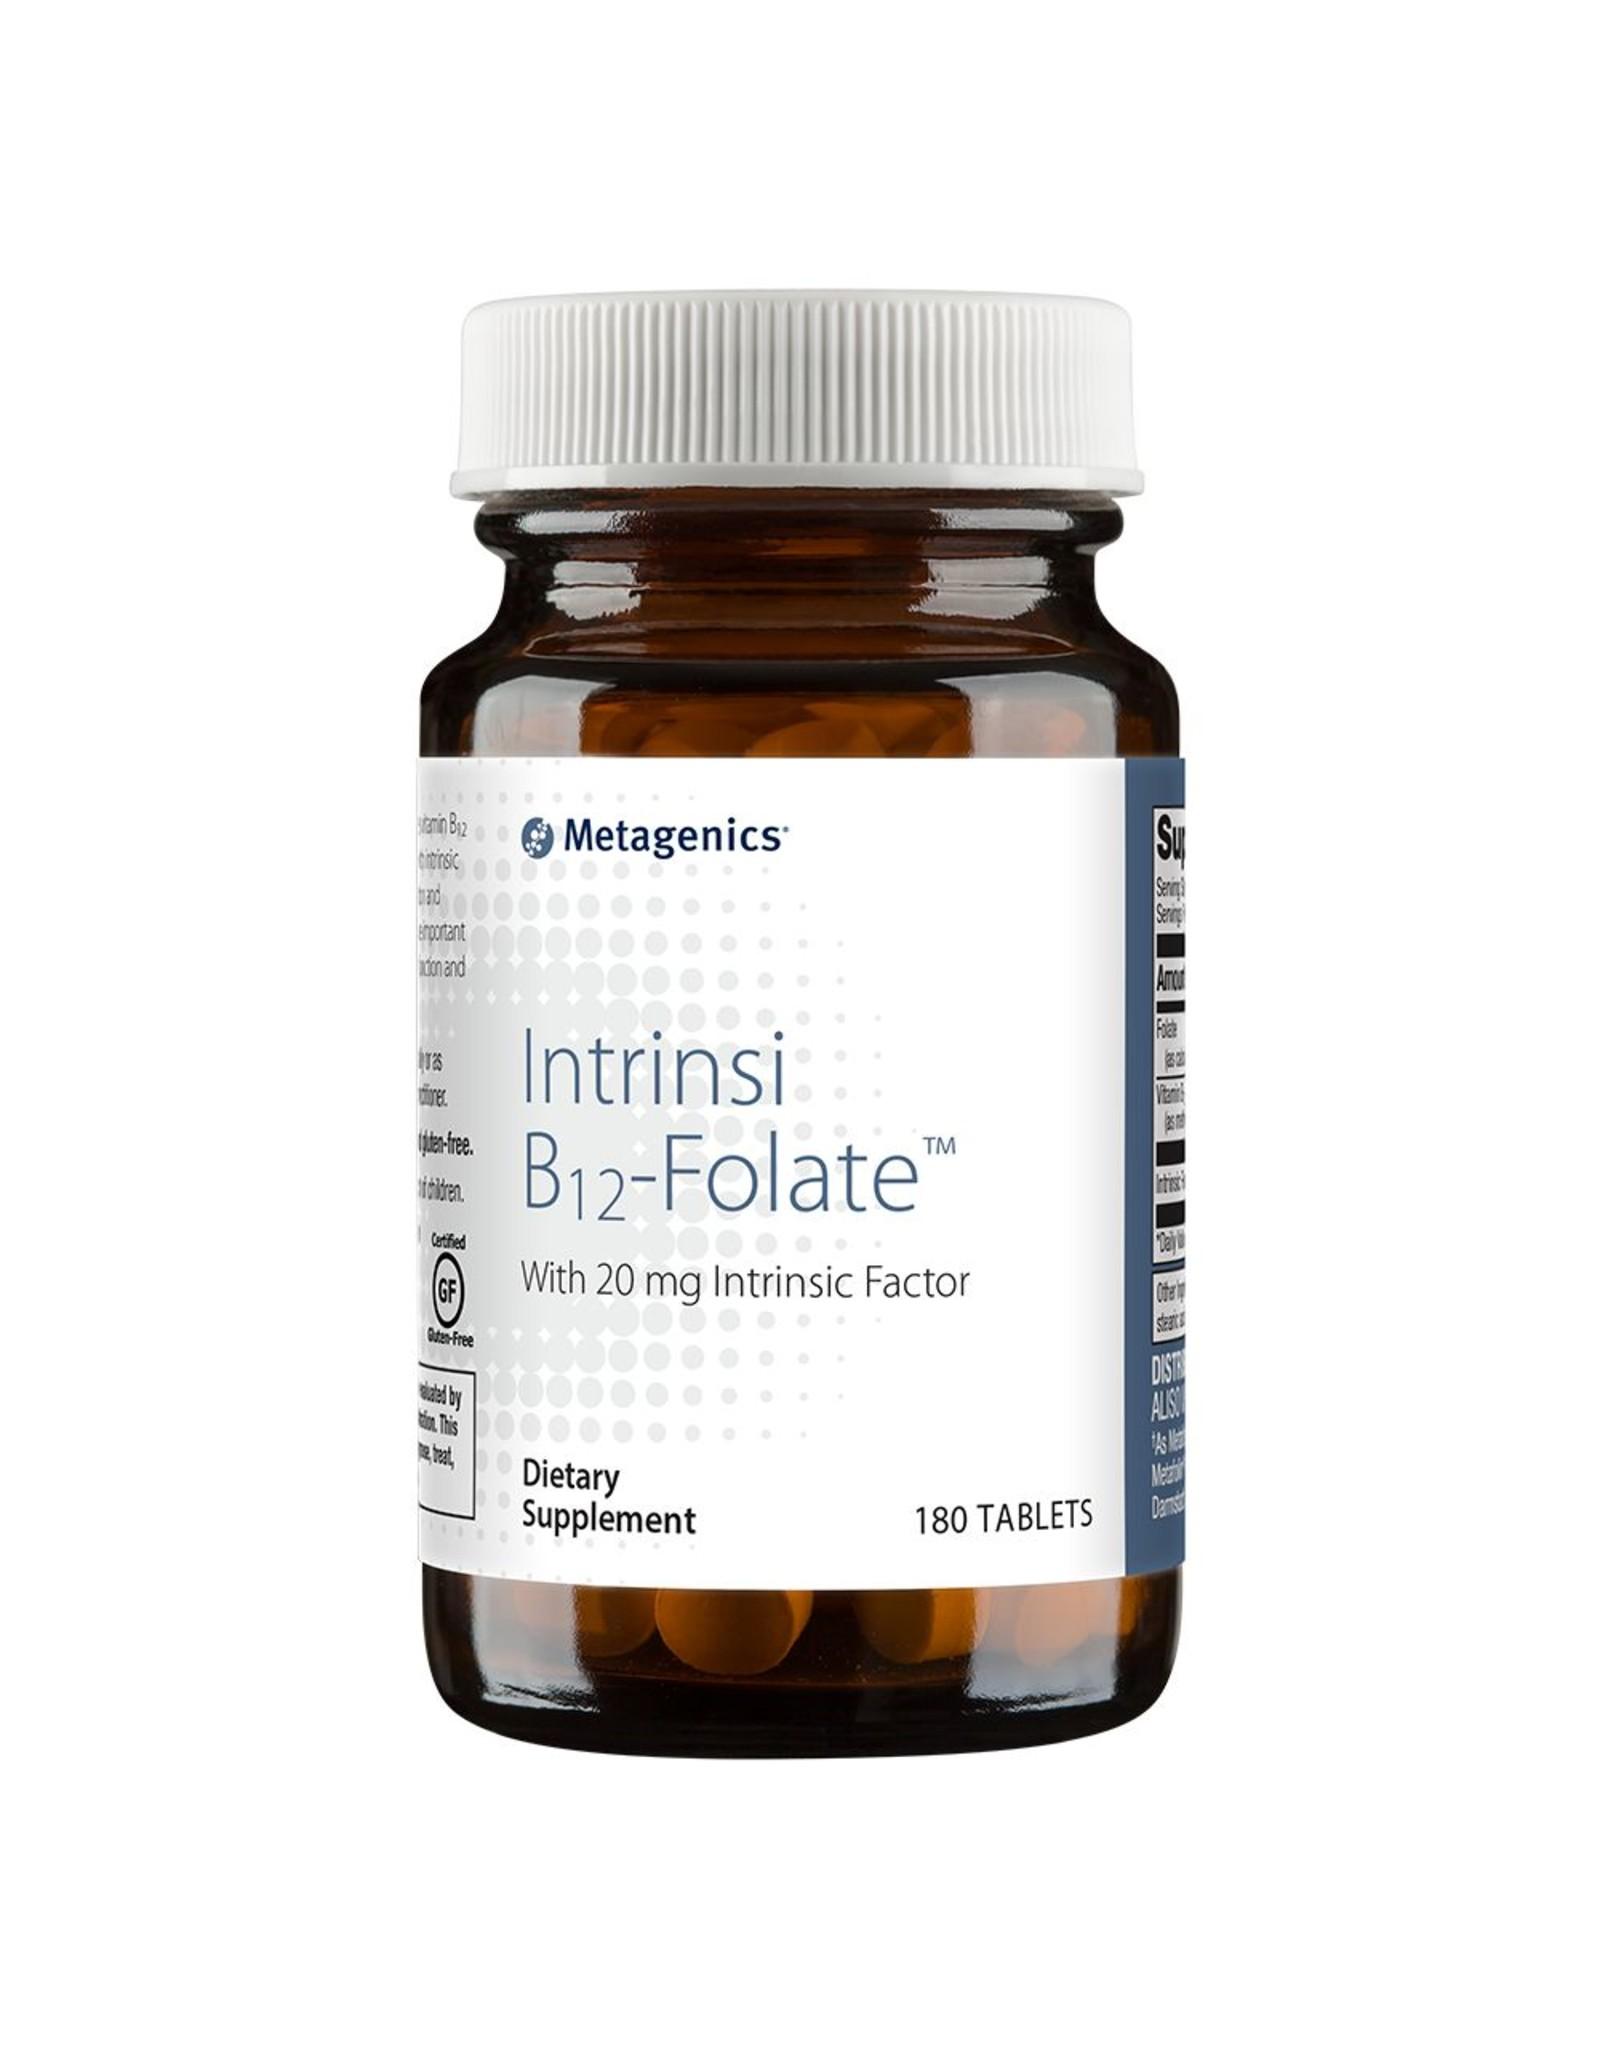 Intrinsi B12 / Folate ™